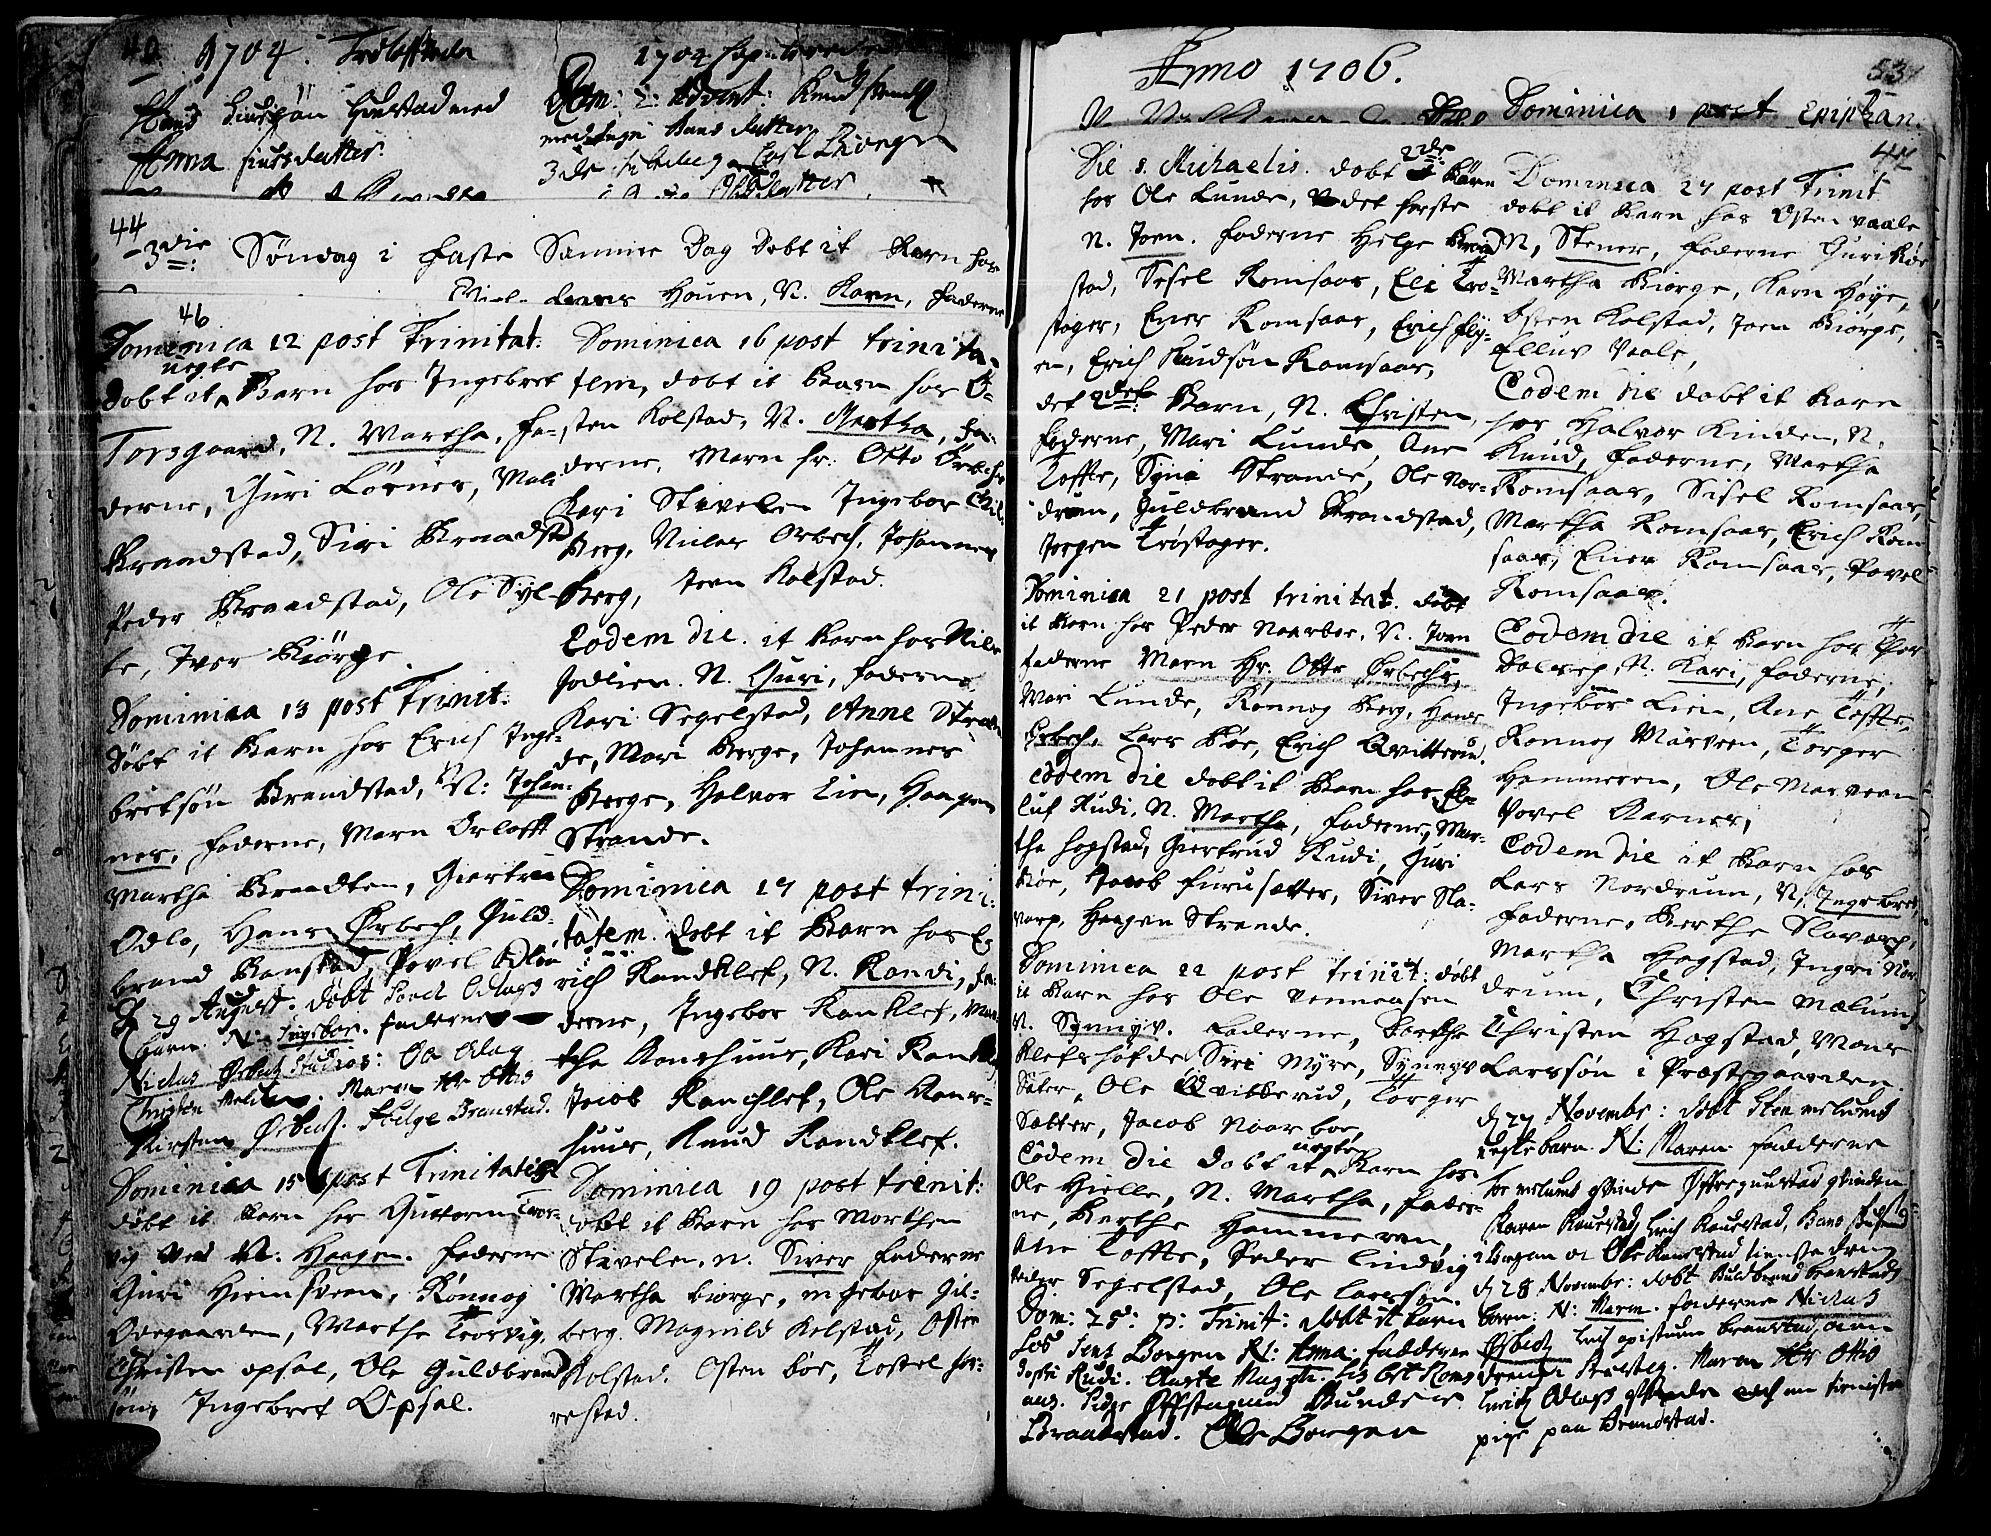 SAH, Ringebu prestekontor, Ministerialbok nr. 1, 1696-1733, s. 46-47